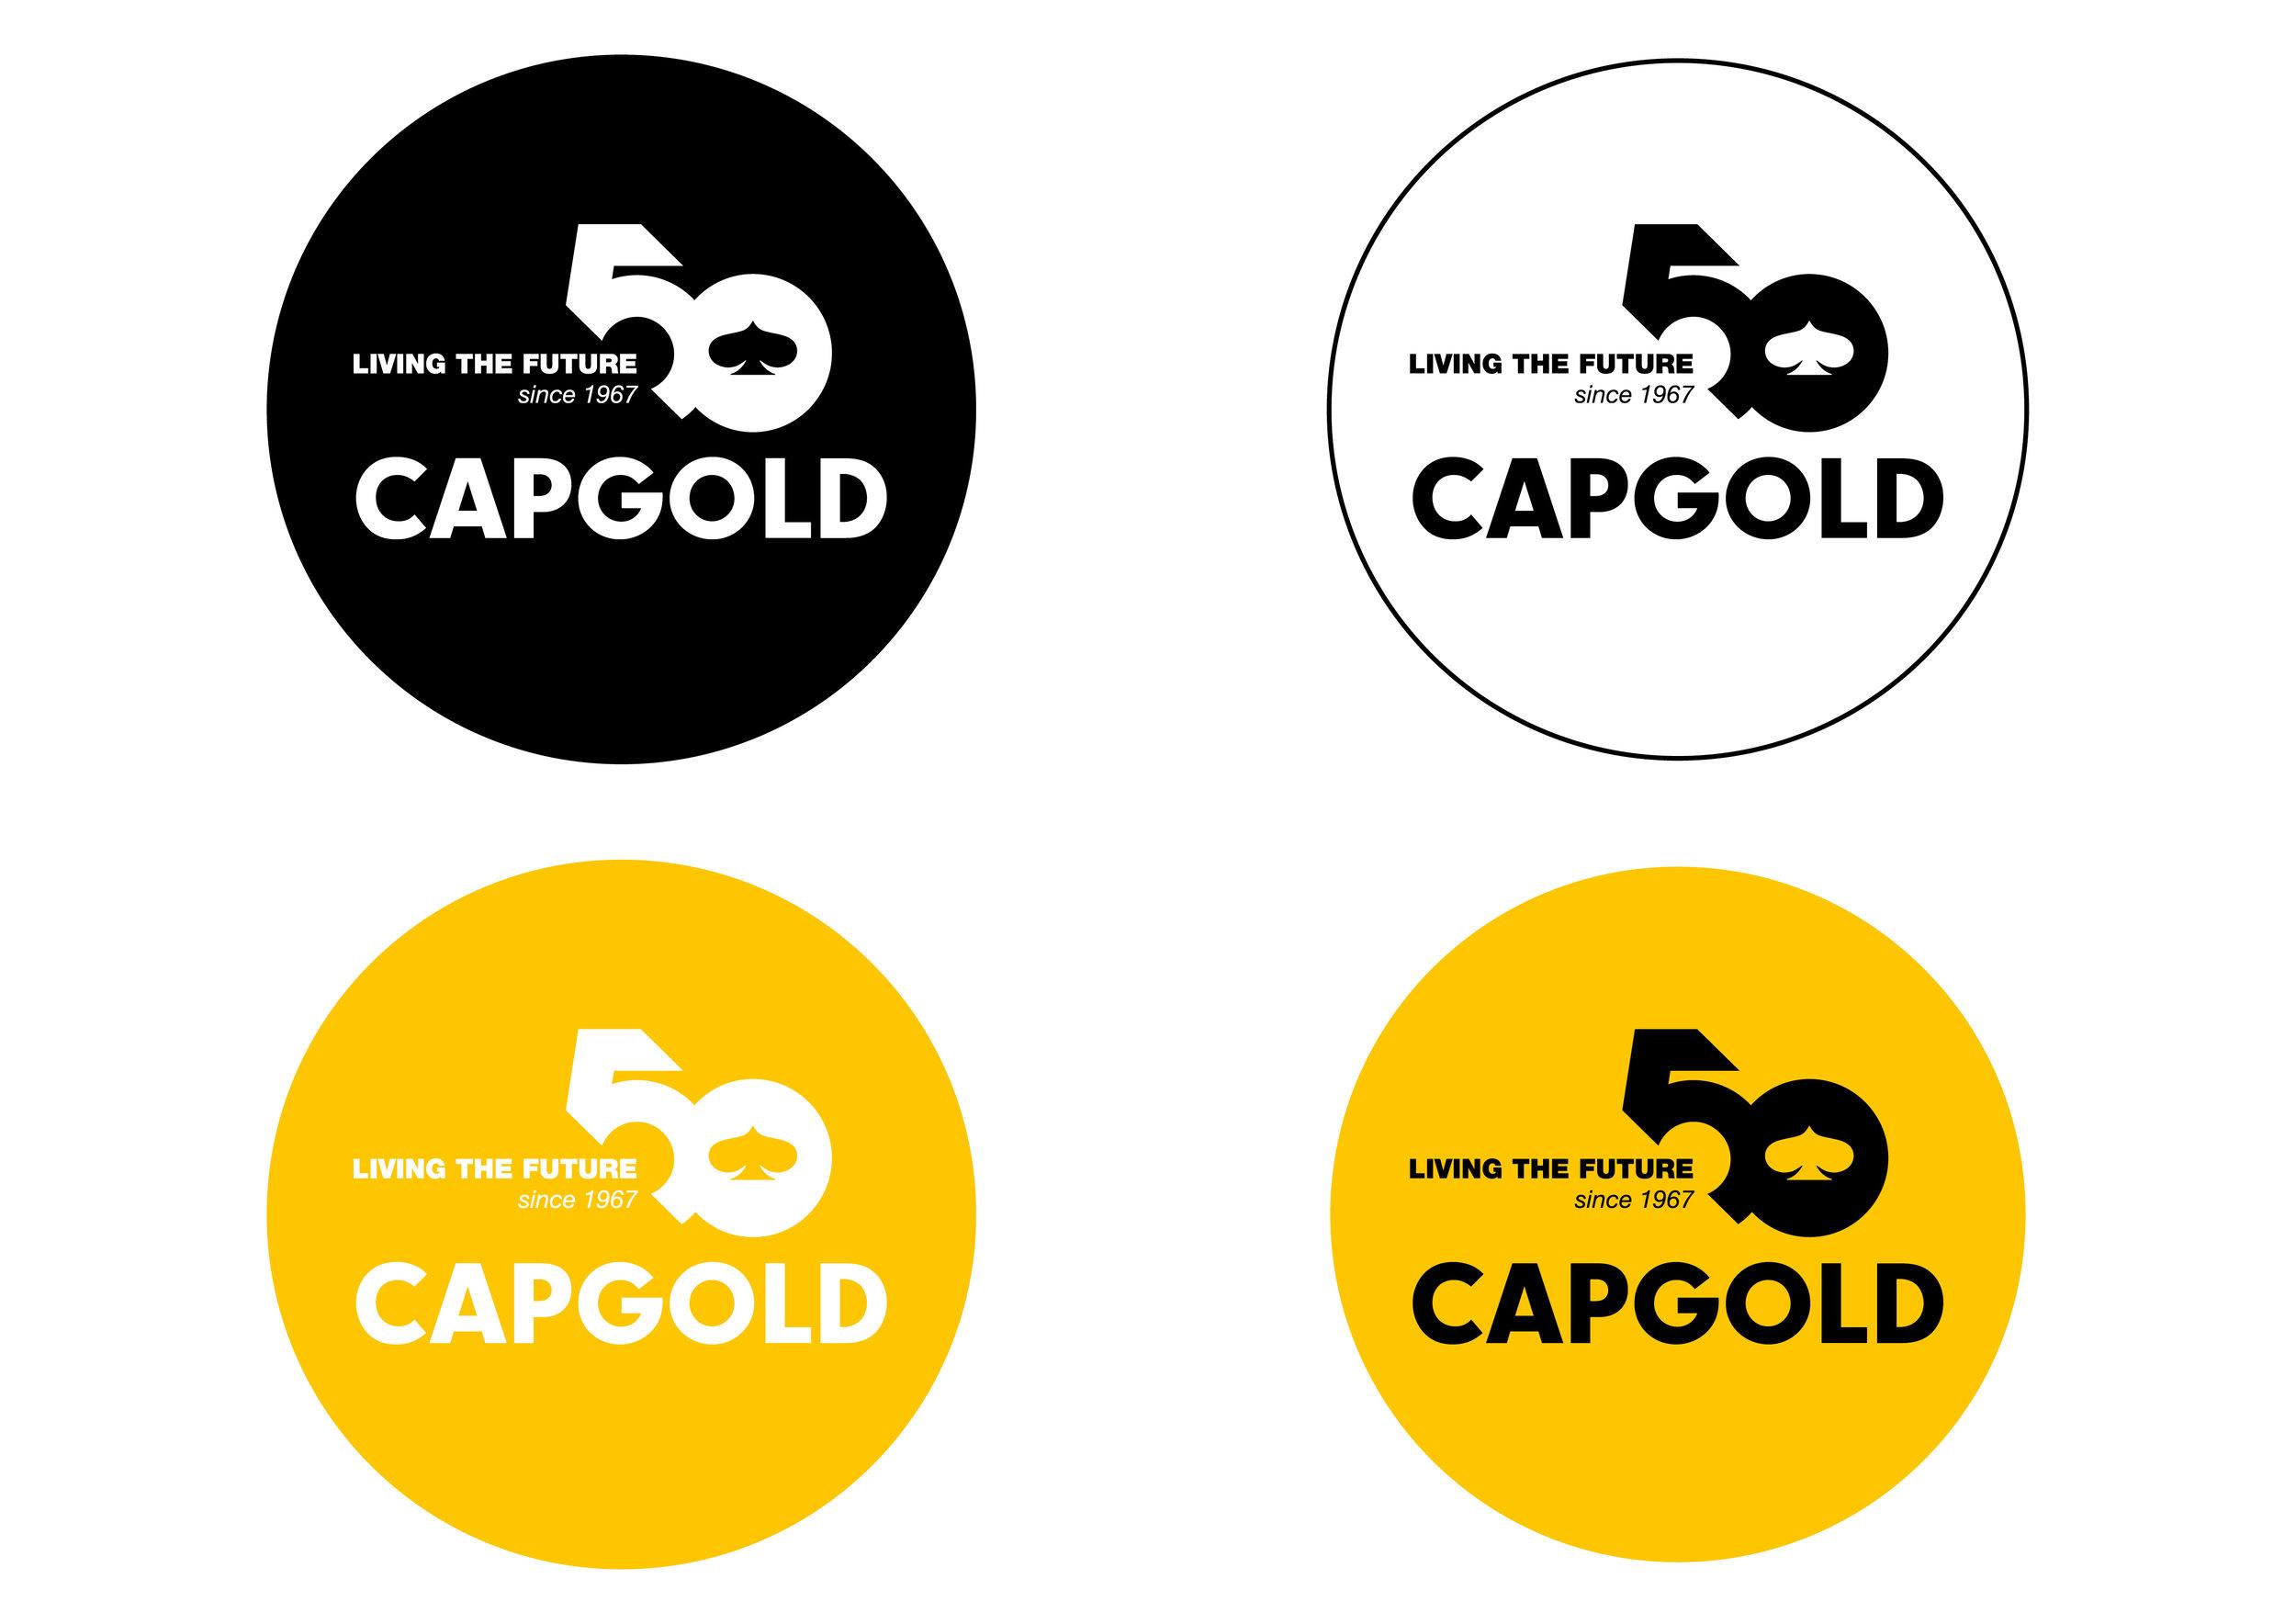 170327_LOGO_CAP_GOLD_DEF.jpg